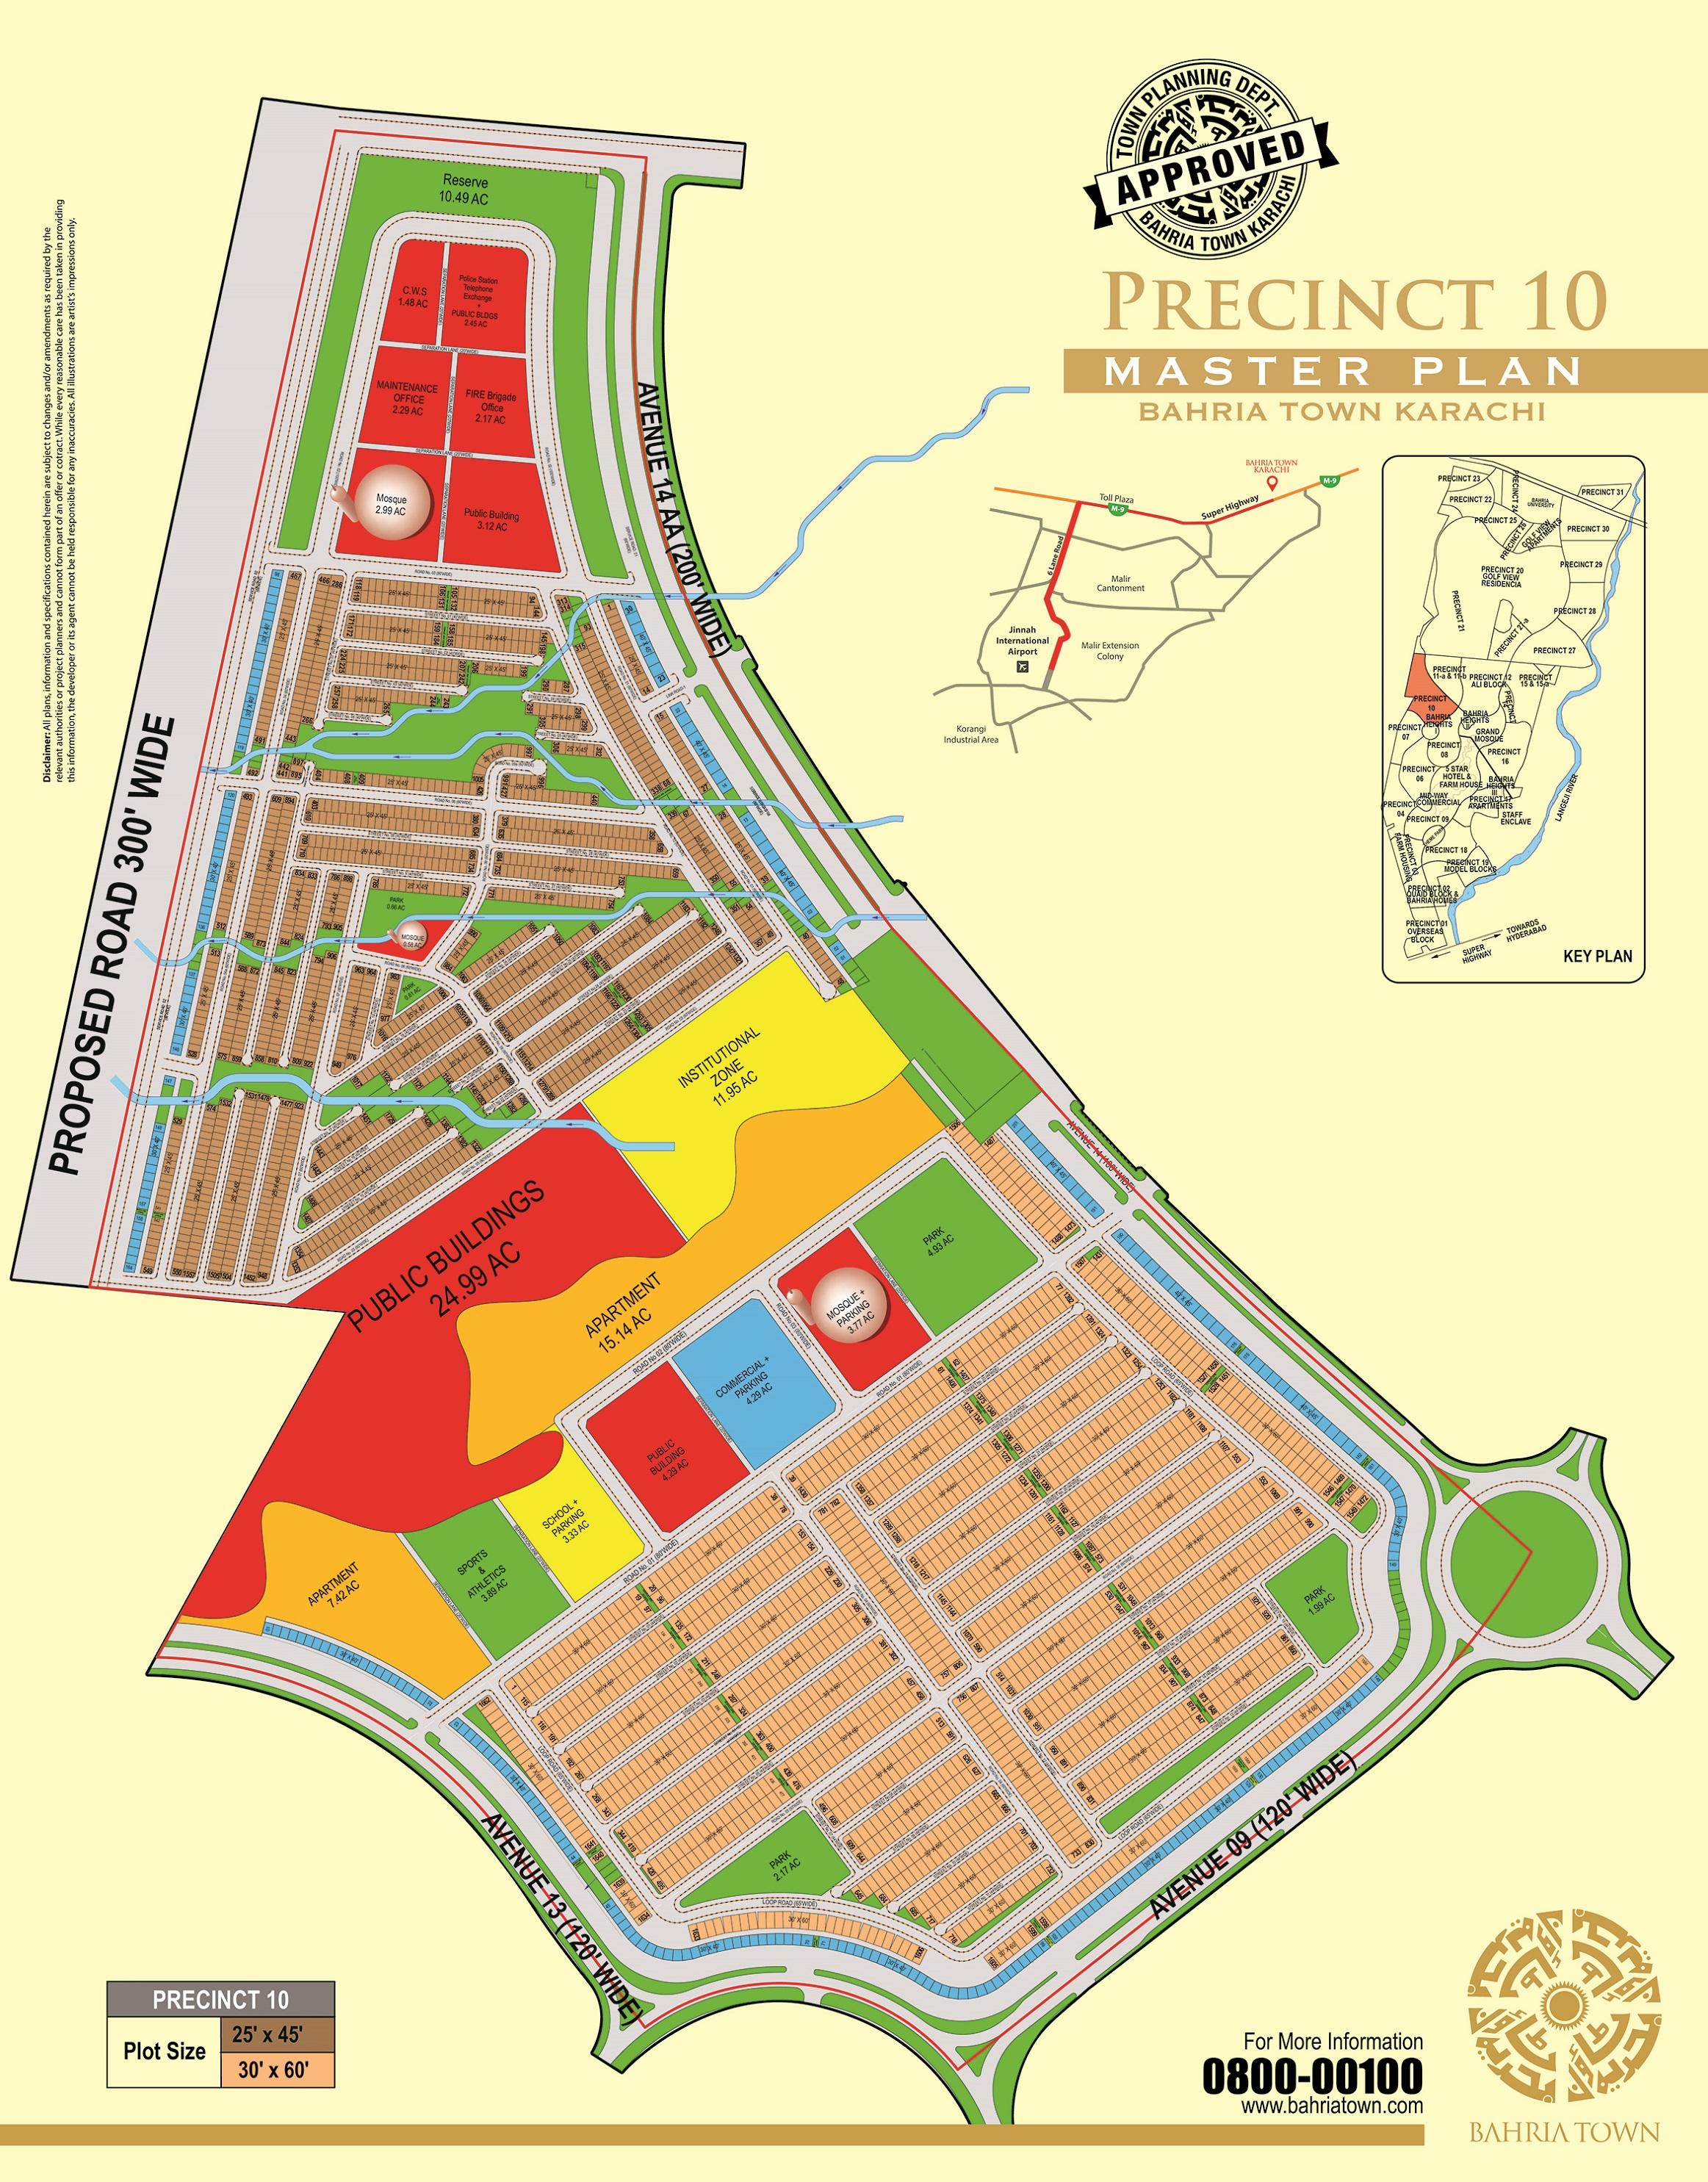 how to find precinct number